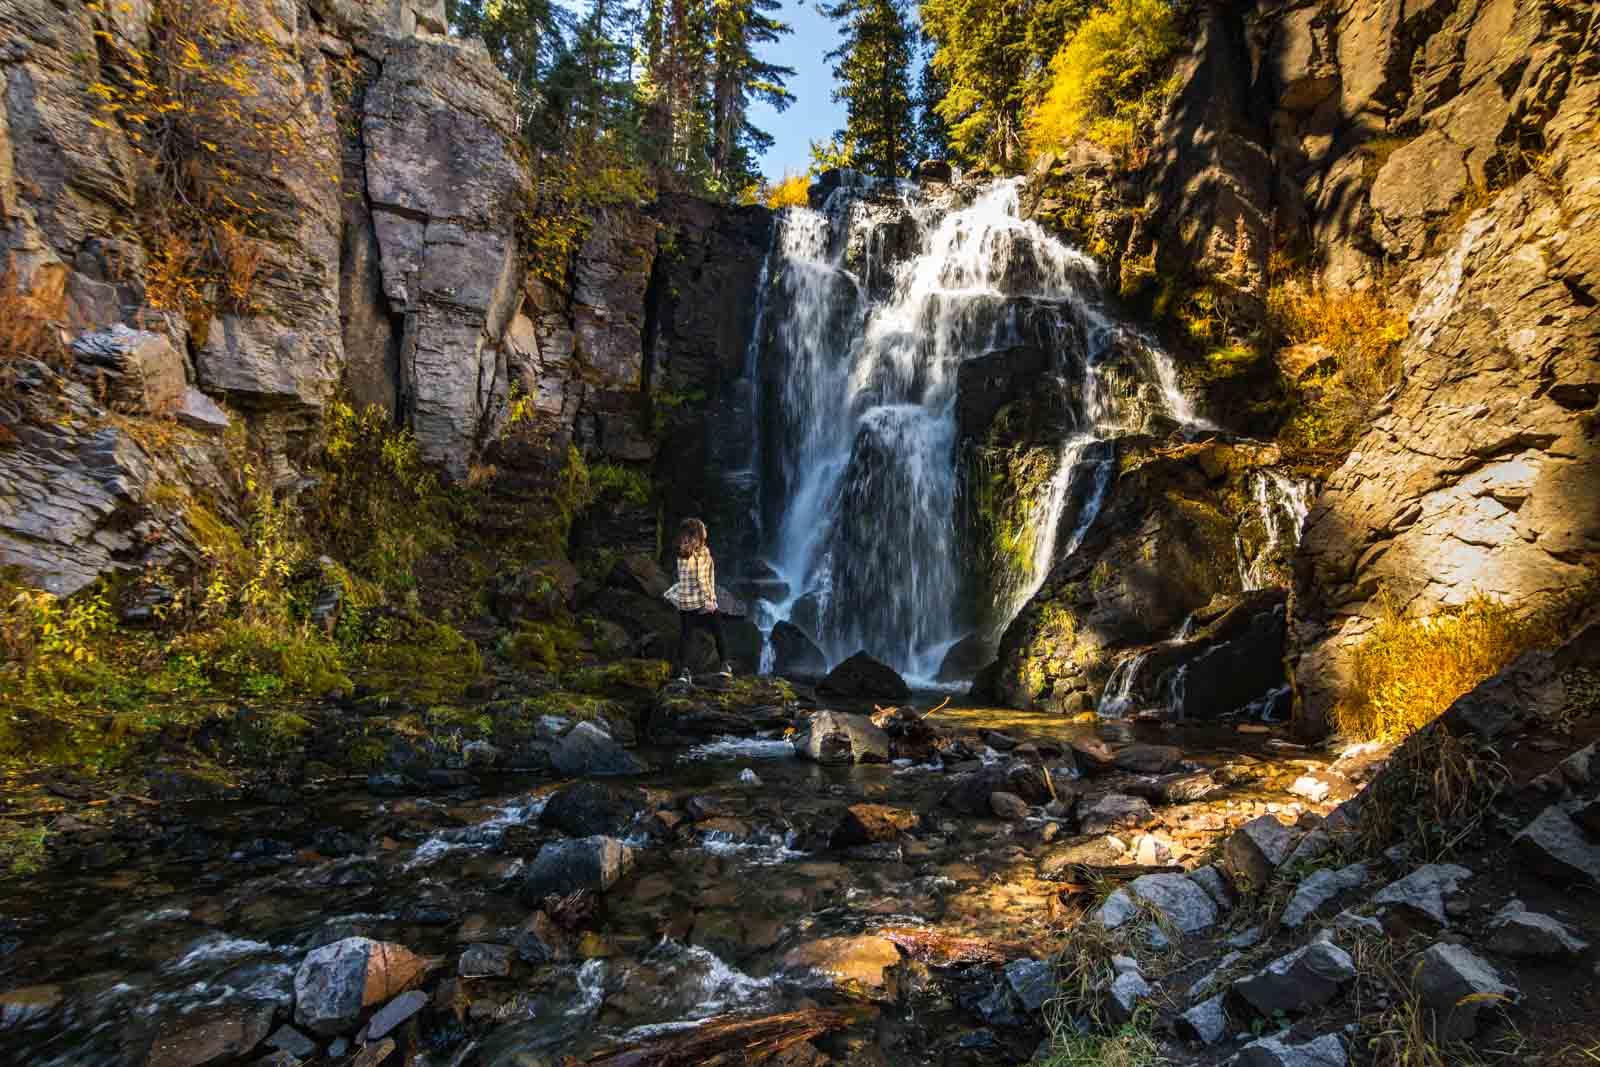 King Creek Falls is a fun thing to do in Northern California